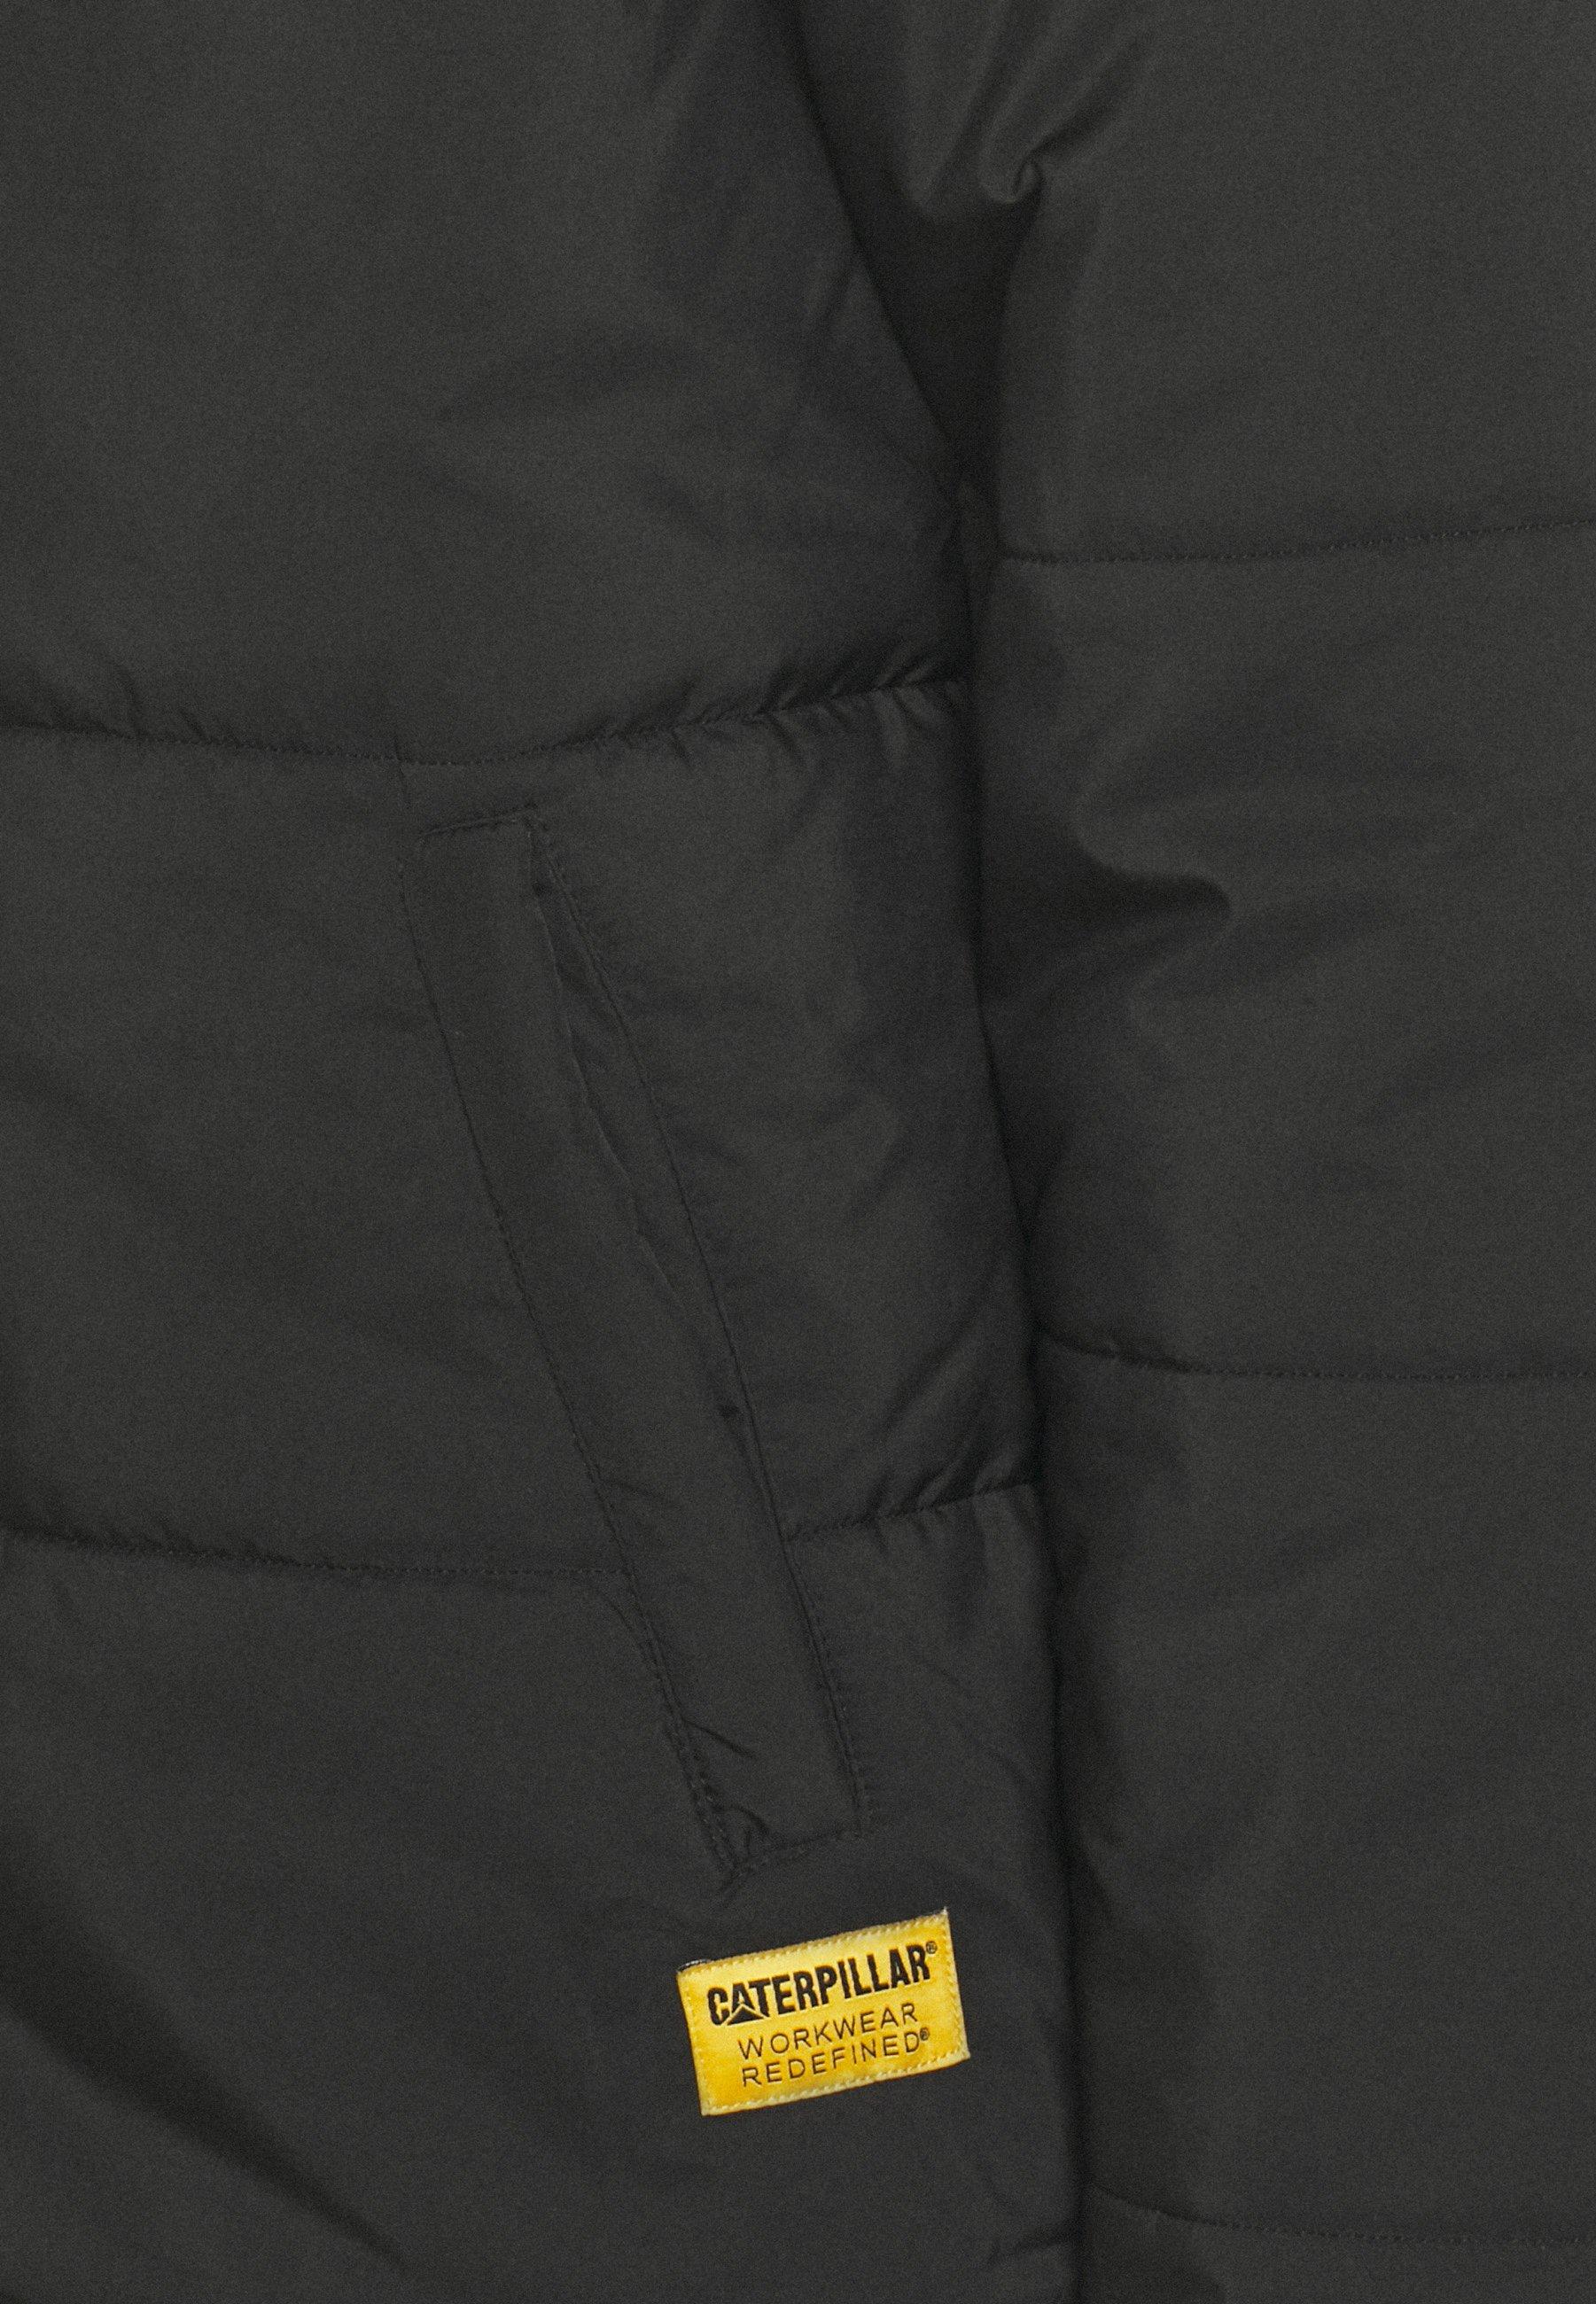 Caterpillar Basic Puffy Jacket - Vinterjakke Black/svart